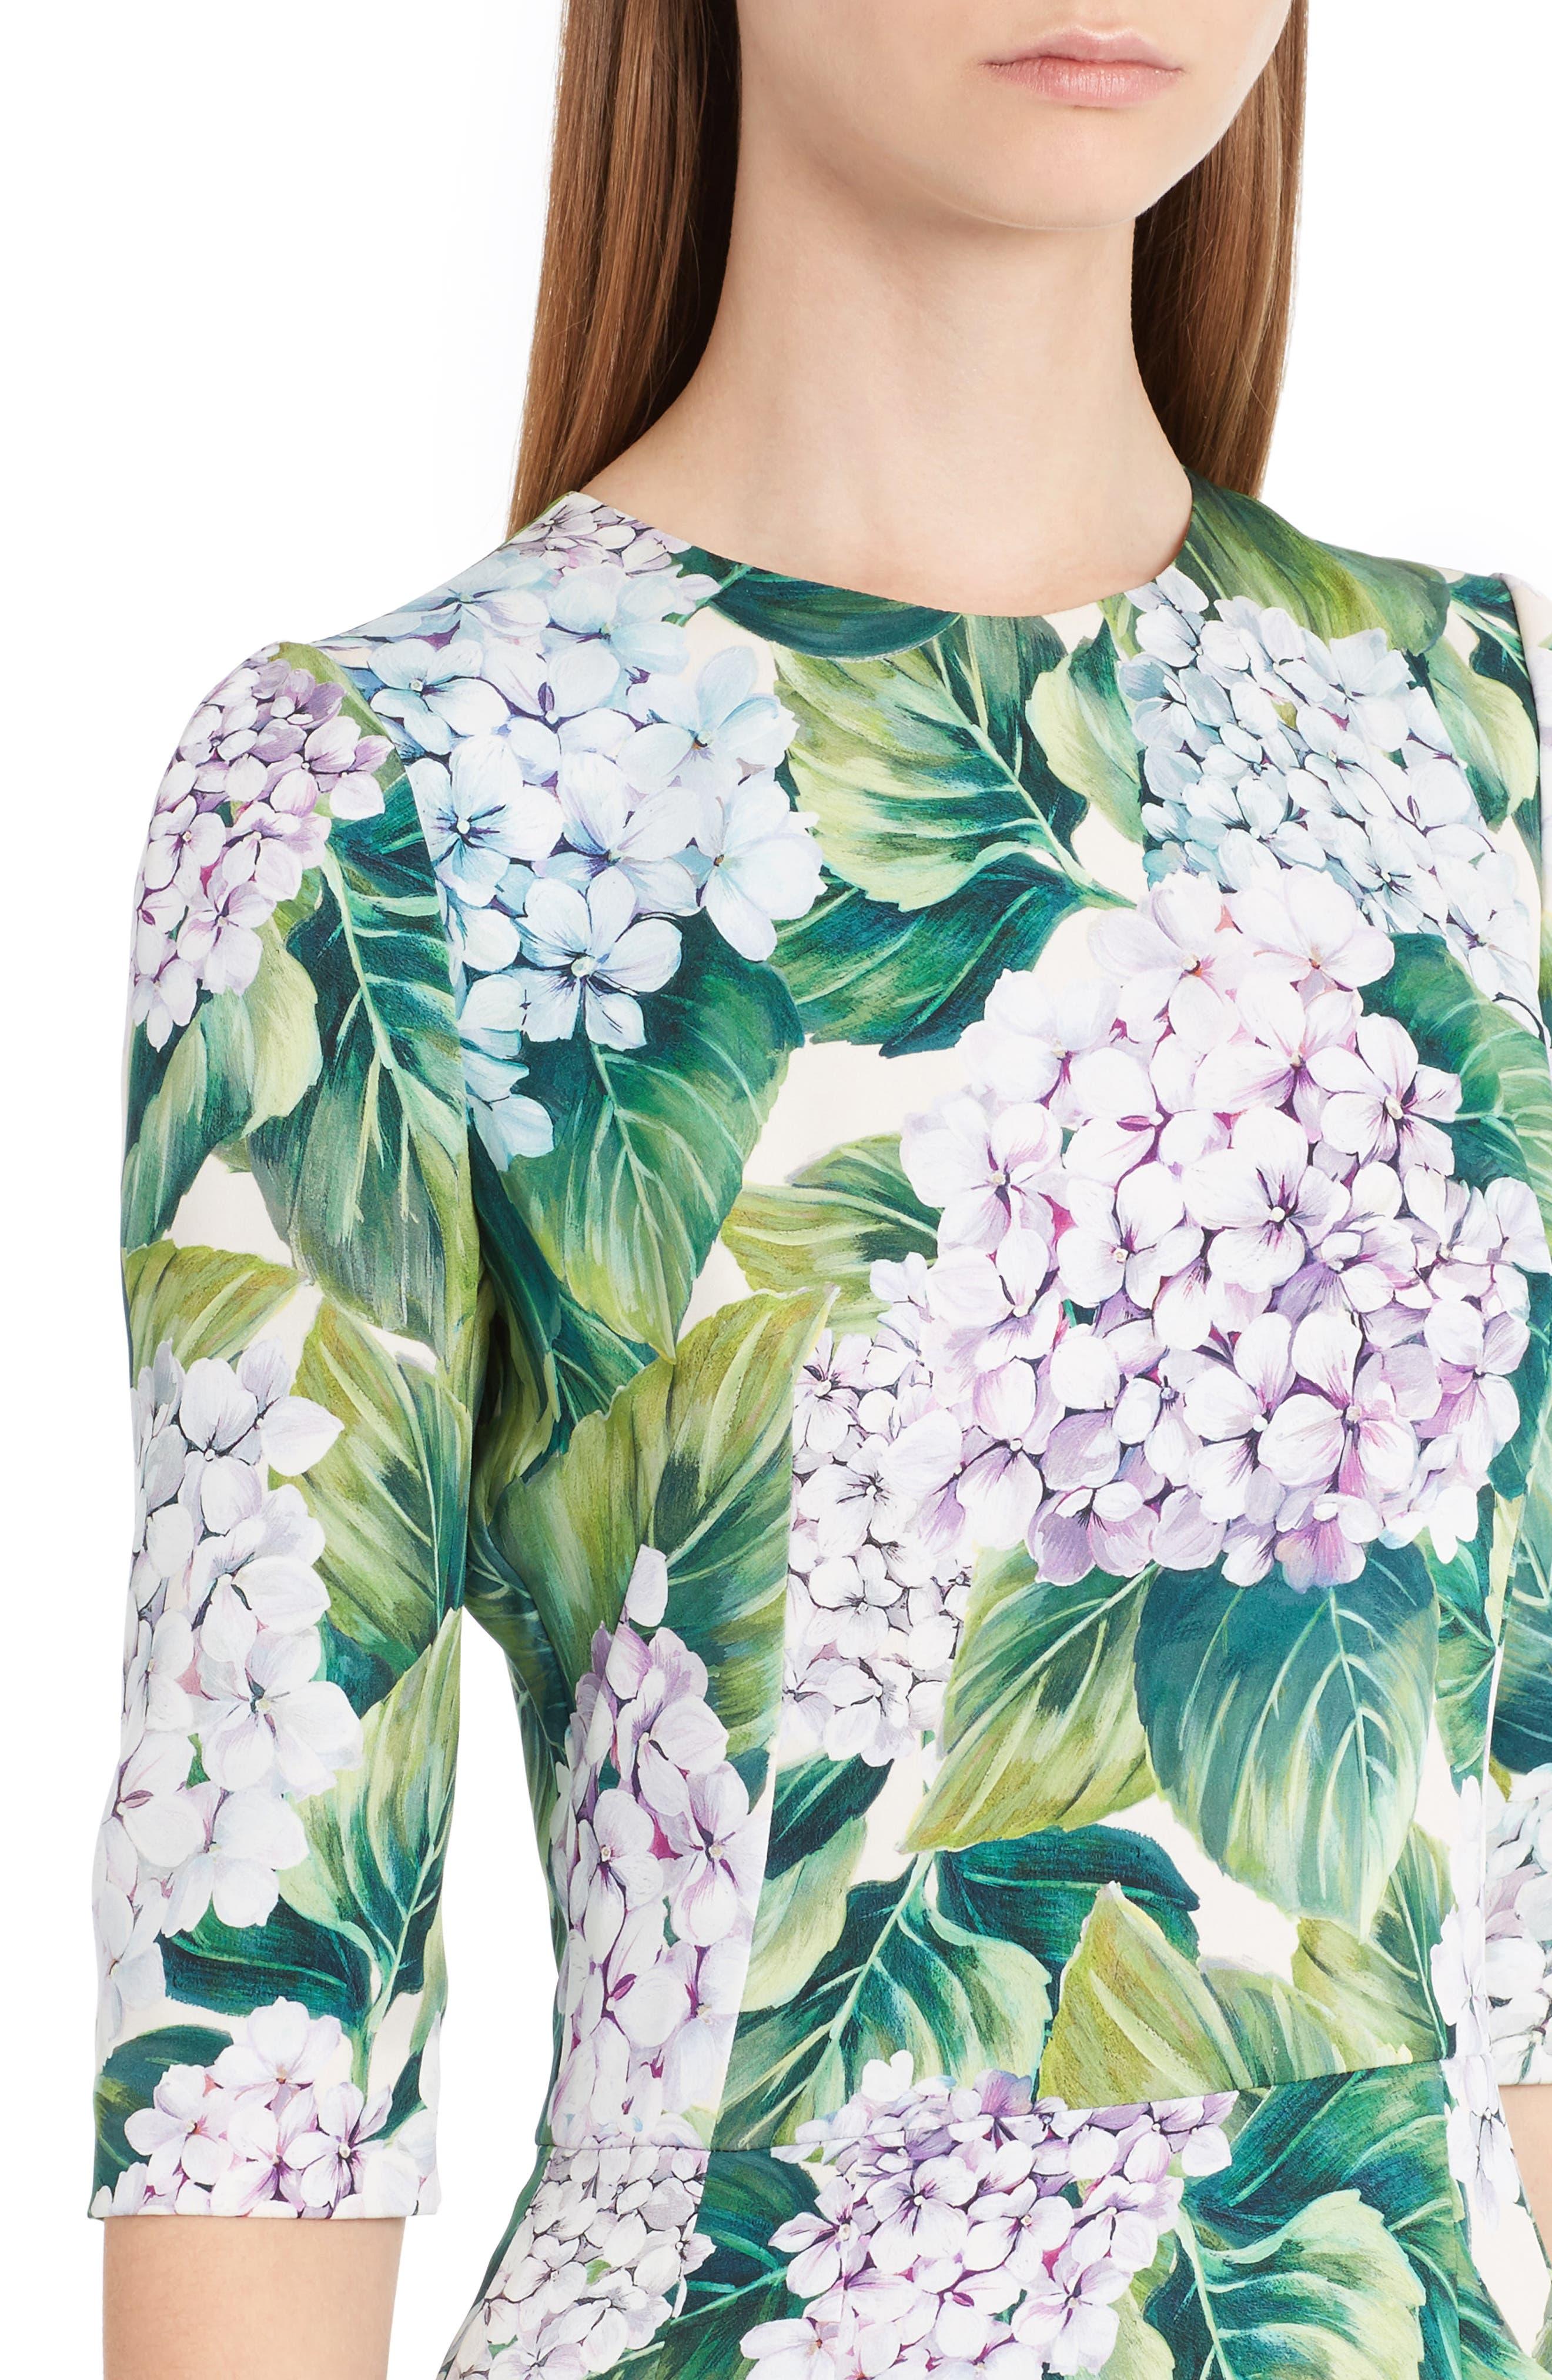 Hydrangea Print Stretch Silk Dress,                             Alternate thumbnail 4, color,                             300